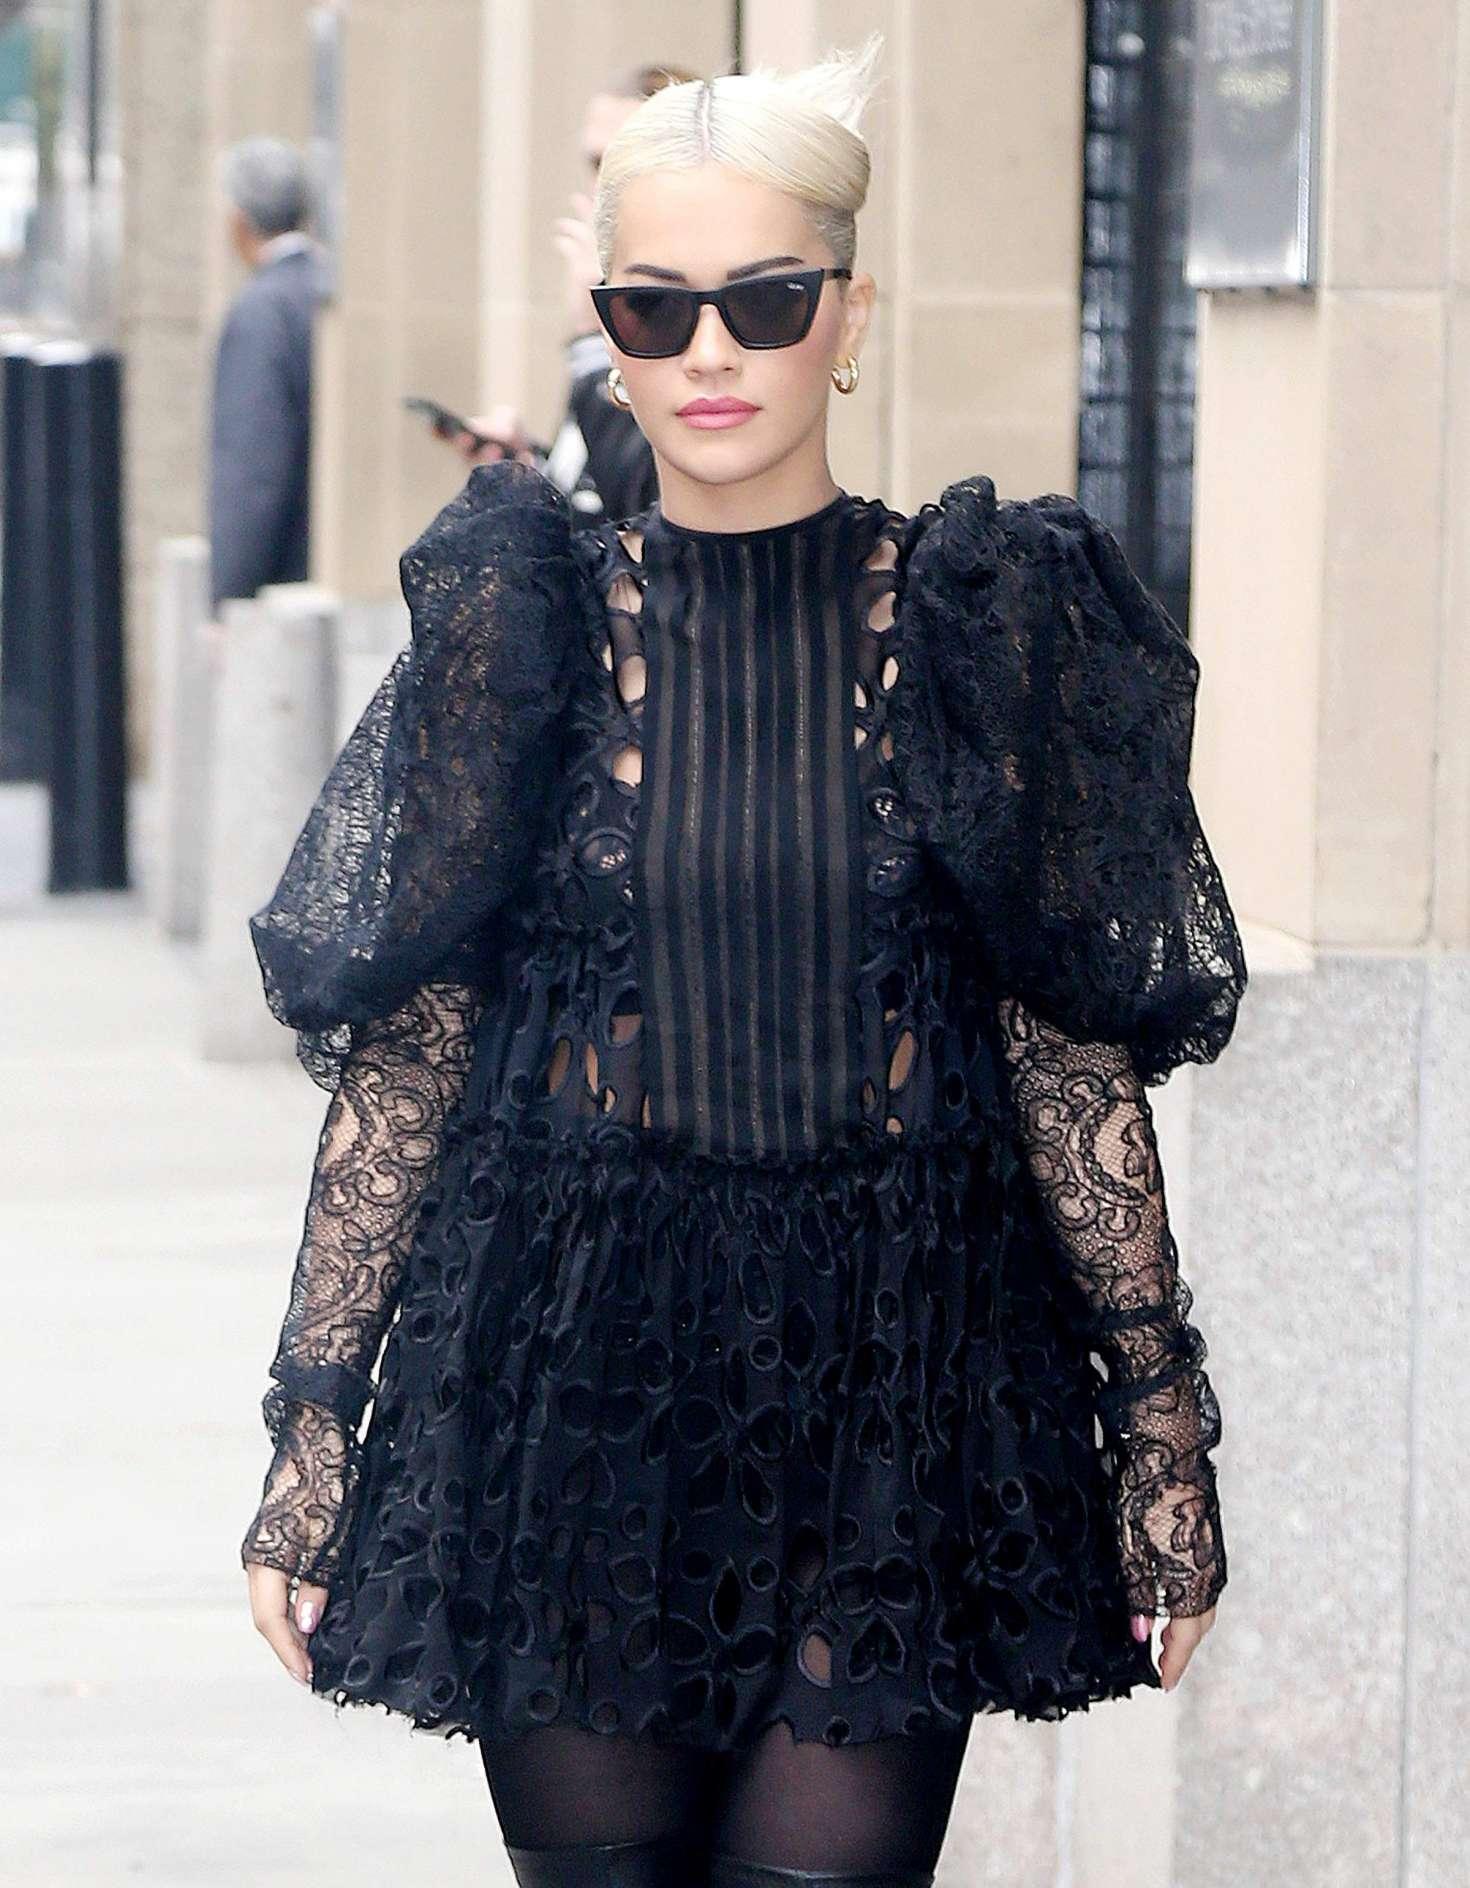 Rita Ora in Black Mini Dress - Out in New York